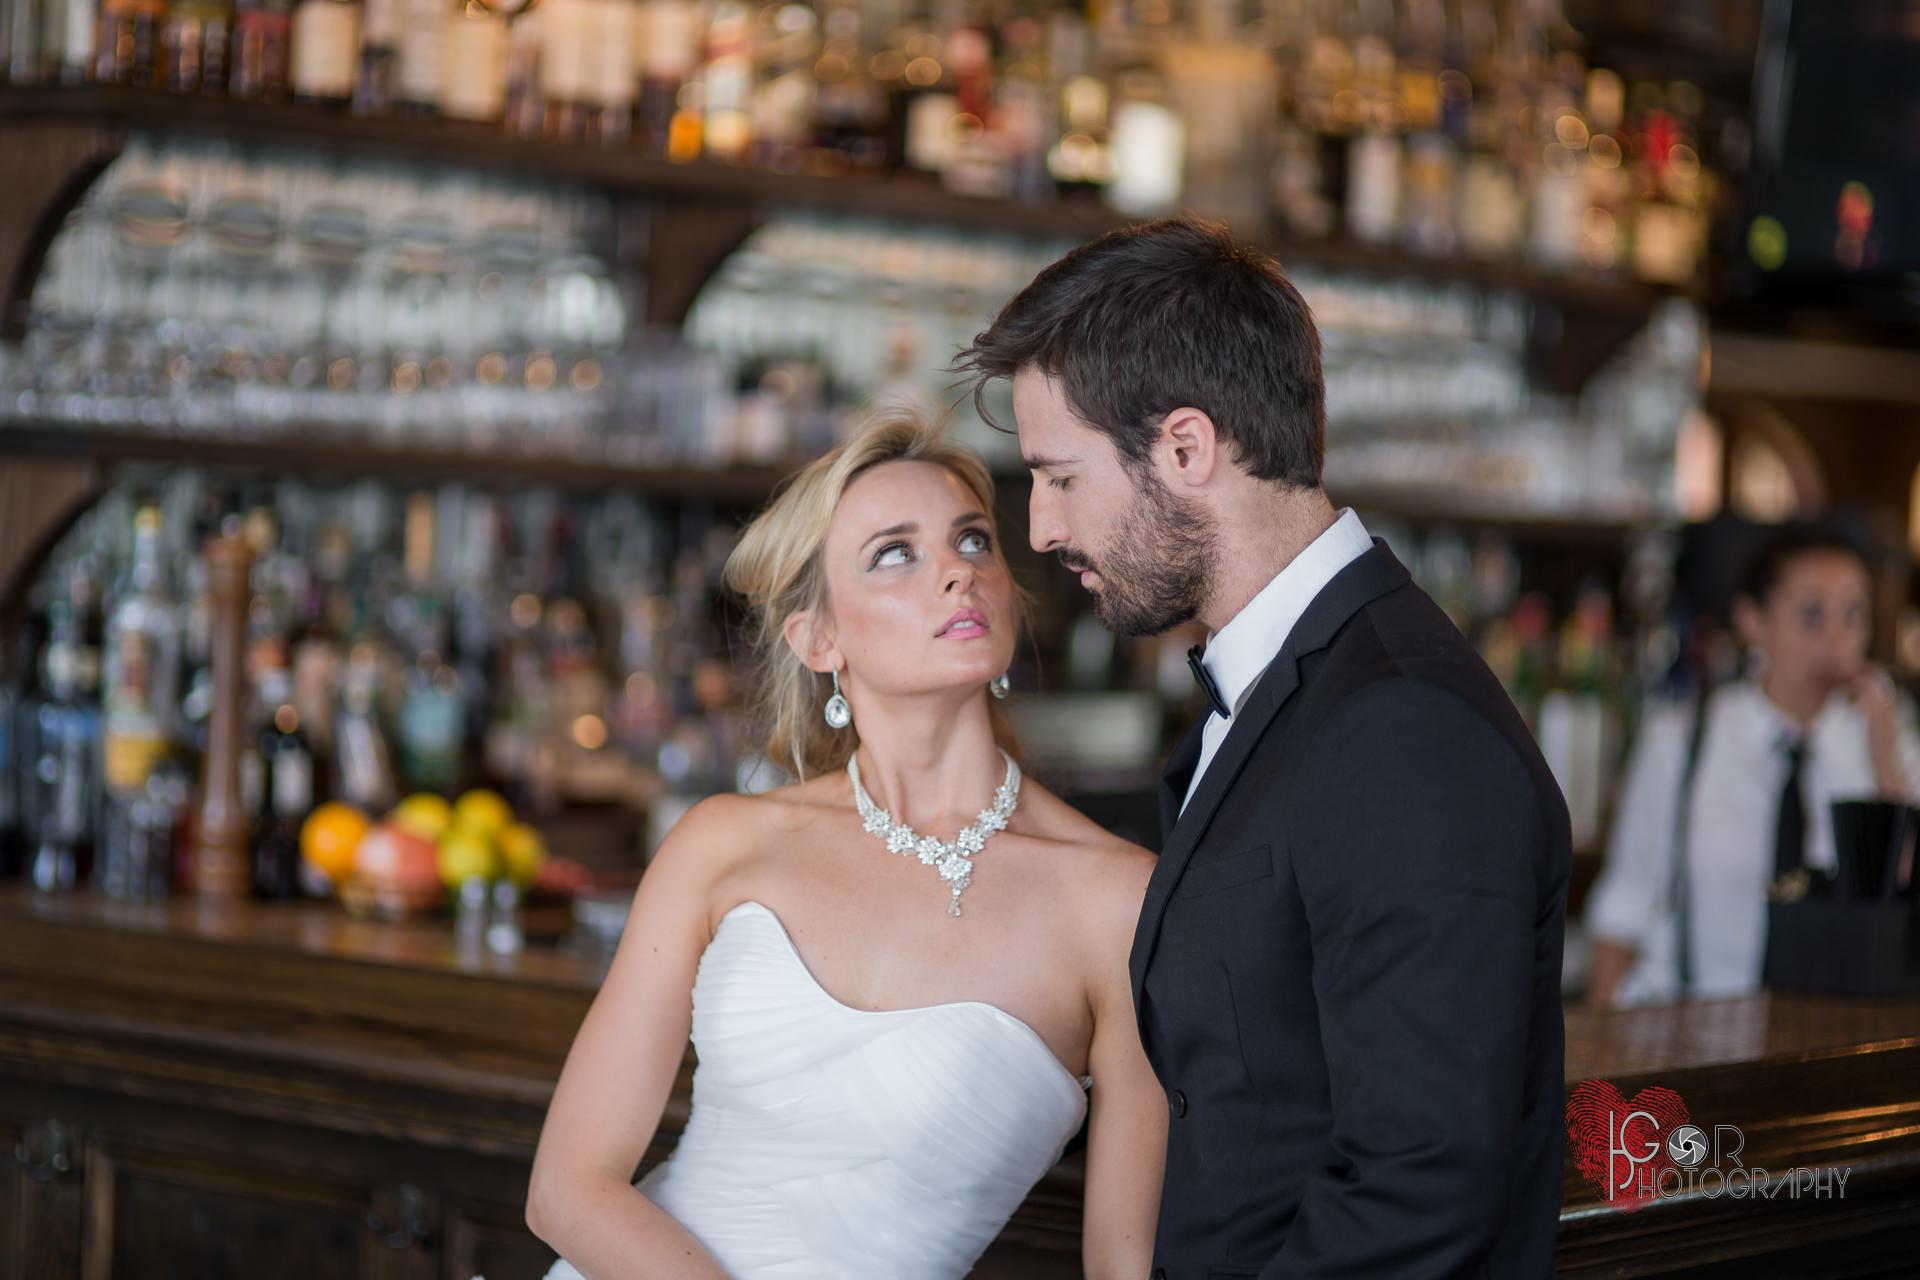 New Orleans bar wedding